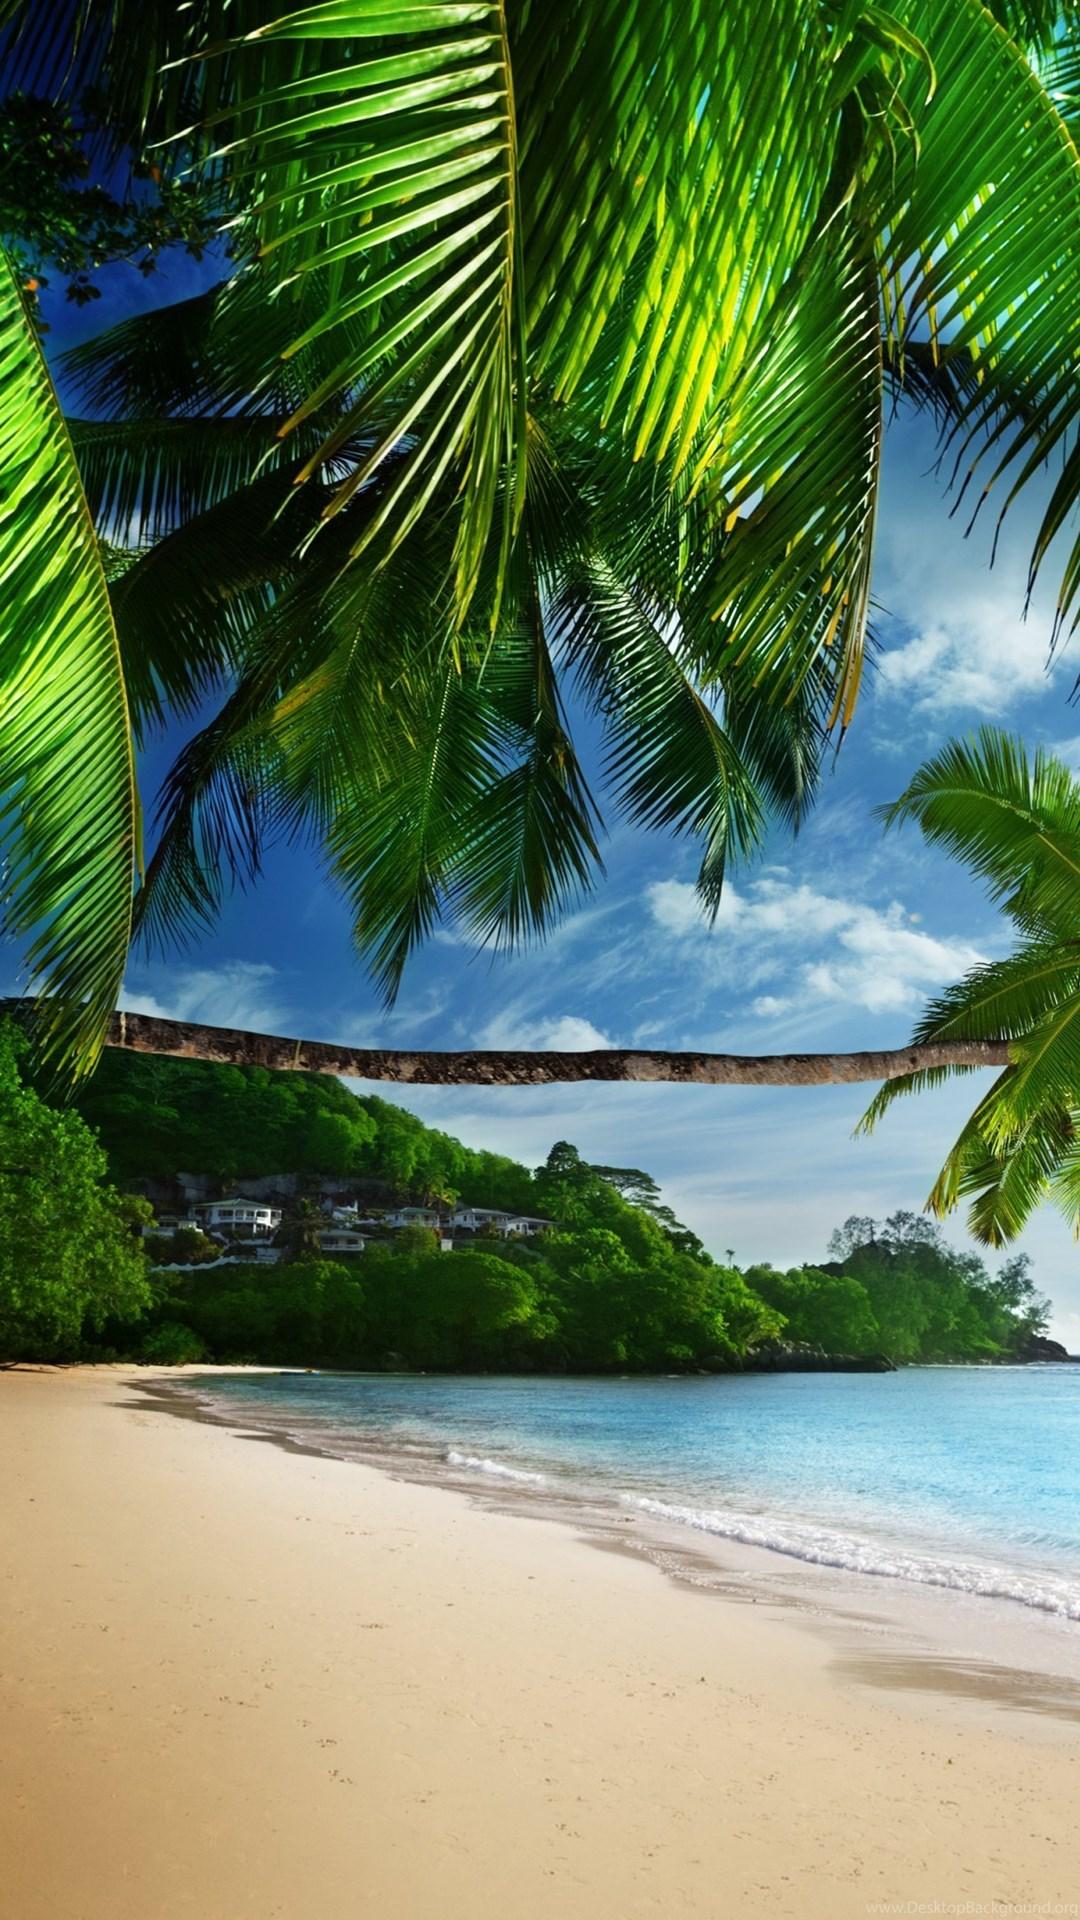 Tropical Beach Paradise 4K Ultra HD Desktop Wallpapers ...